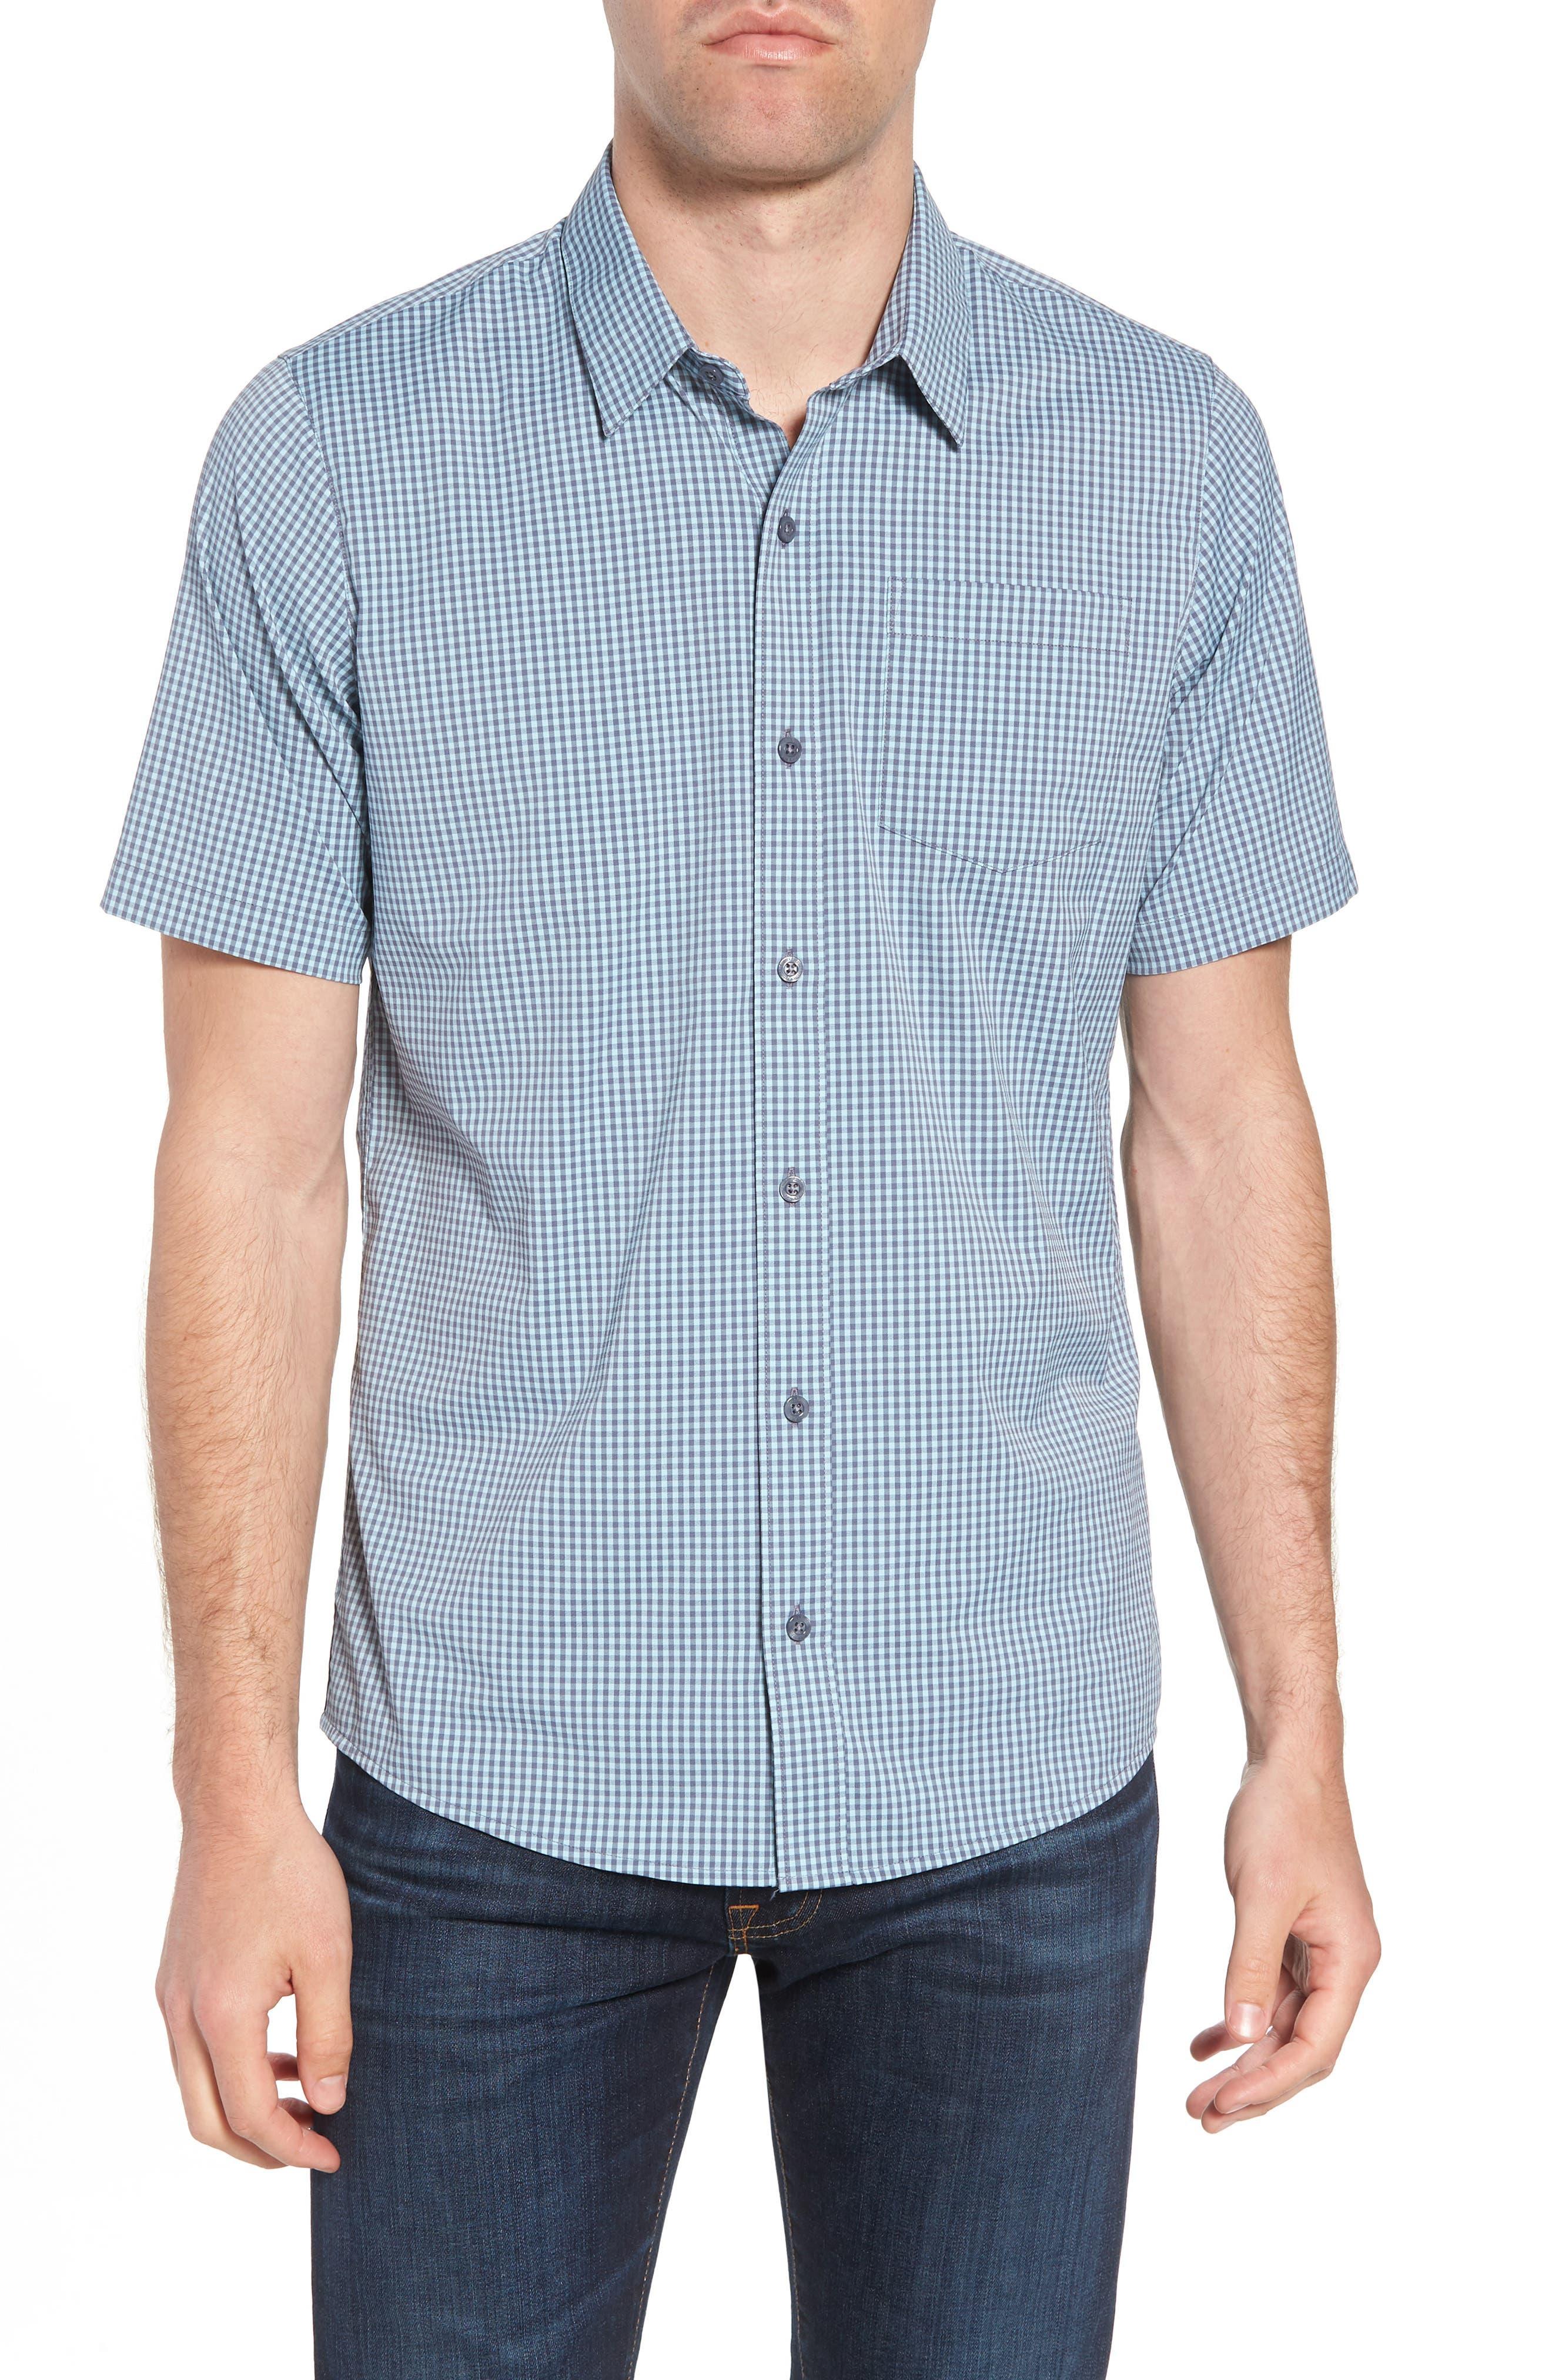 Gygax Regular Fit Sport Shirt,                         Main,                         color, 400